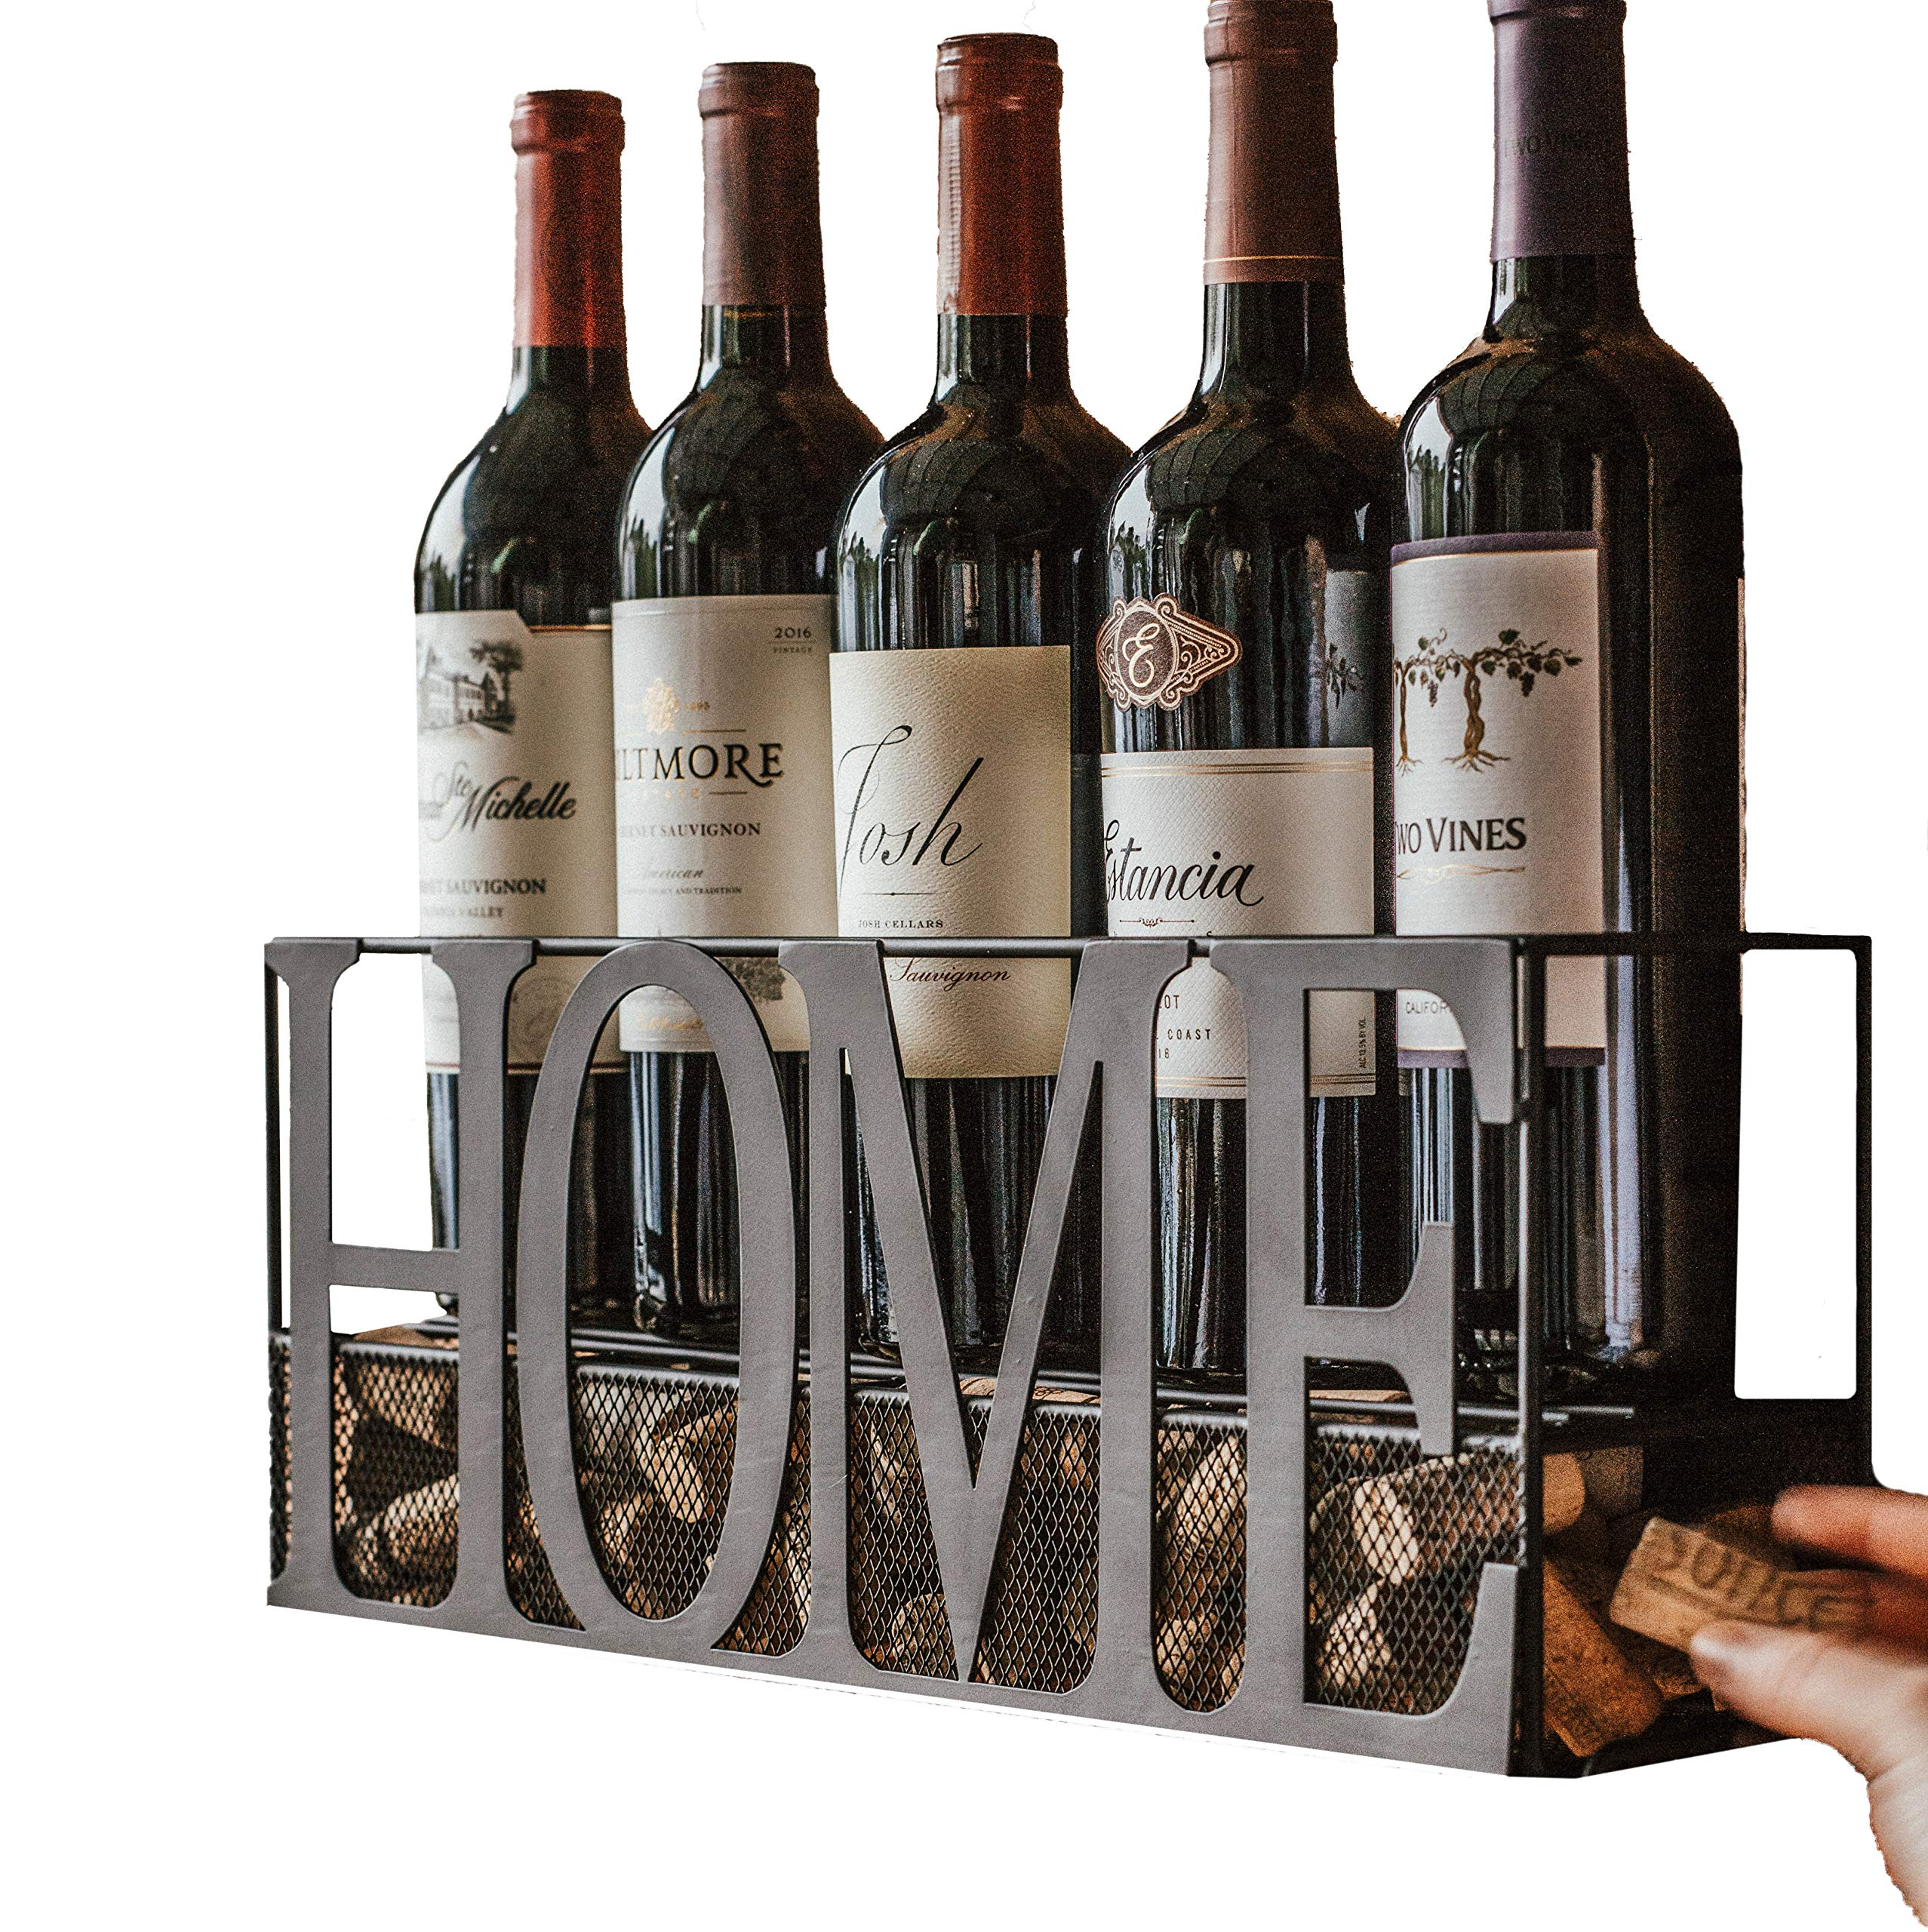 MKZ Products Wall Mounted Metal Home Wine Rack   Wine Bottle   Hanging Stemware Glass Holder   Cork Storage   Storage Rack   Home & Kitchen Decor